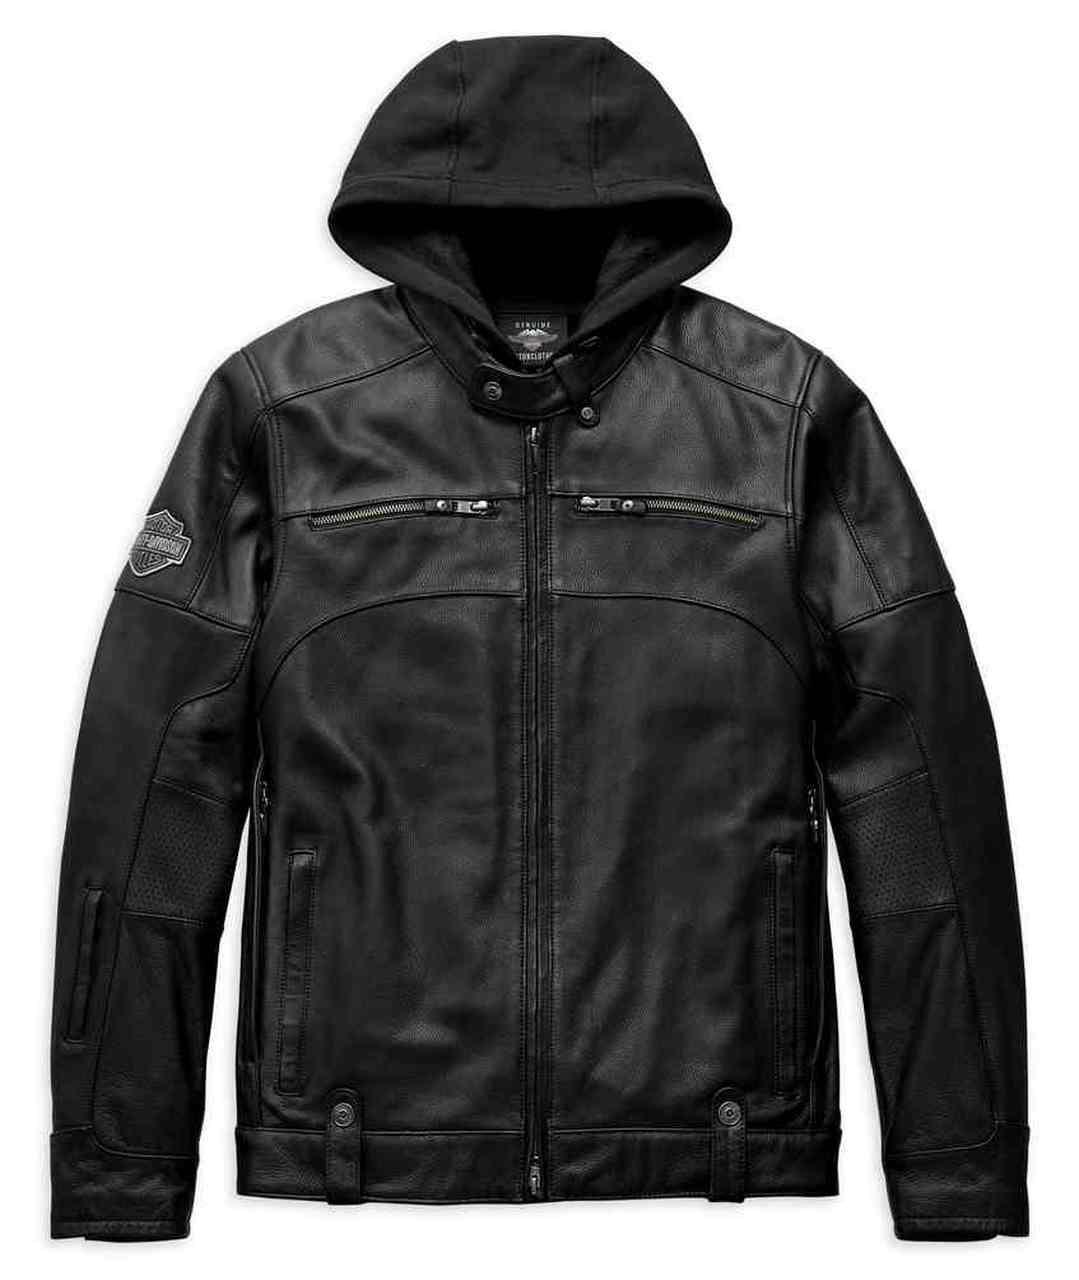 Harley-Davidson® Men's Swingarm 3-IN-1 Leather Jacket, Black